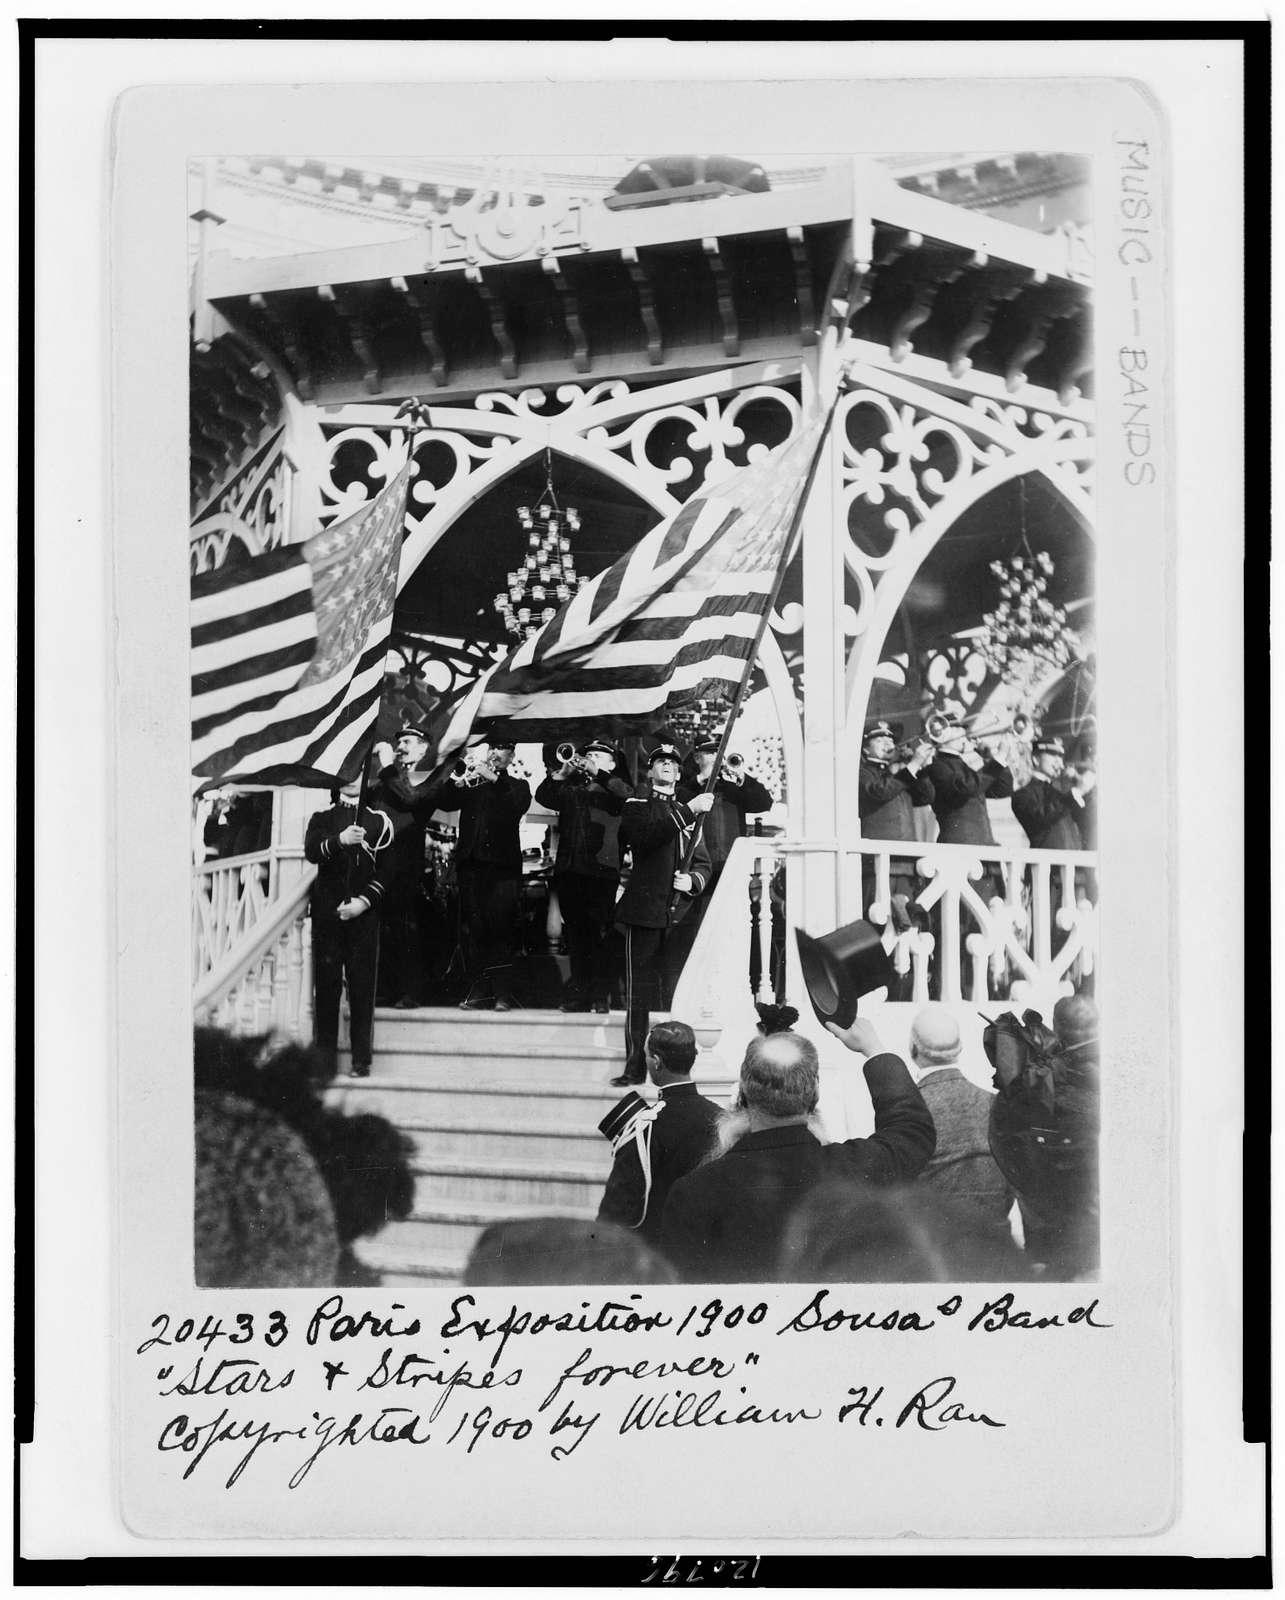 "Paris Exposition 1900--Sousa's band--""Stars & Stripes forever"""